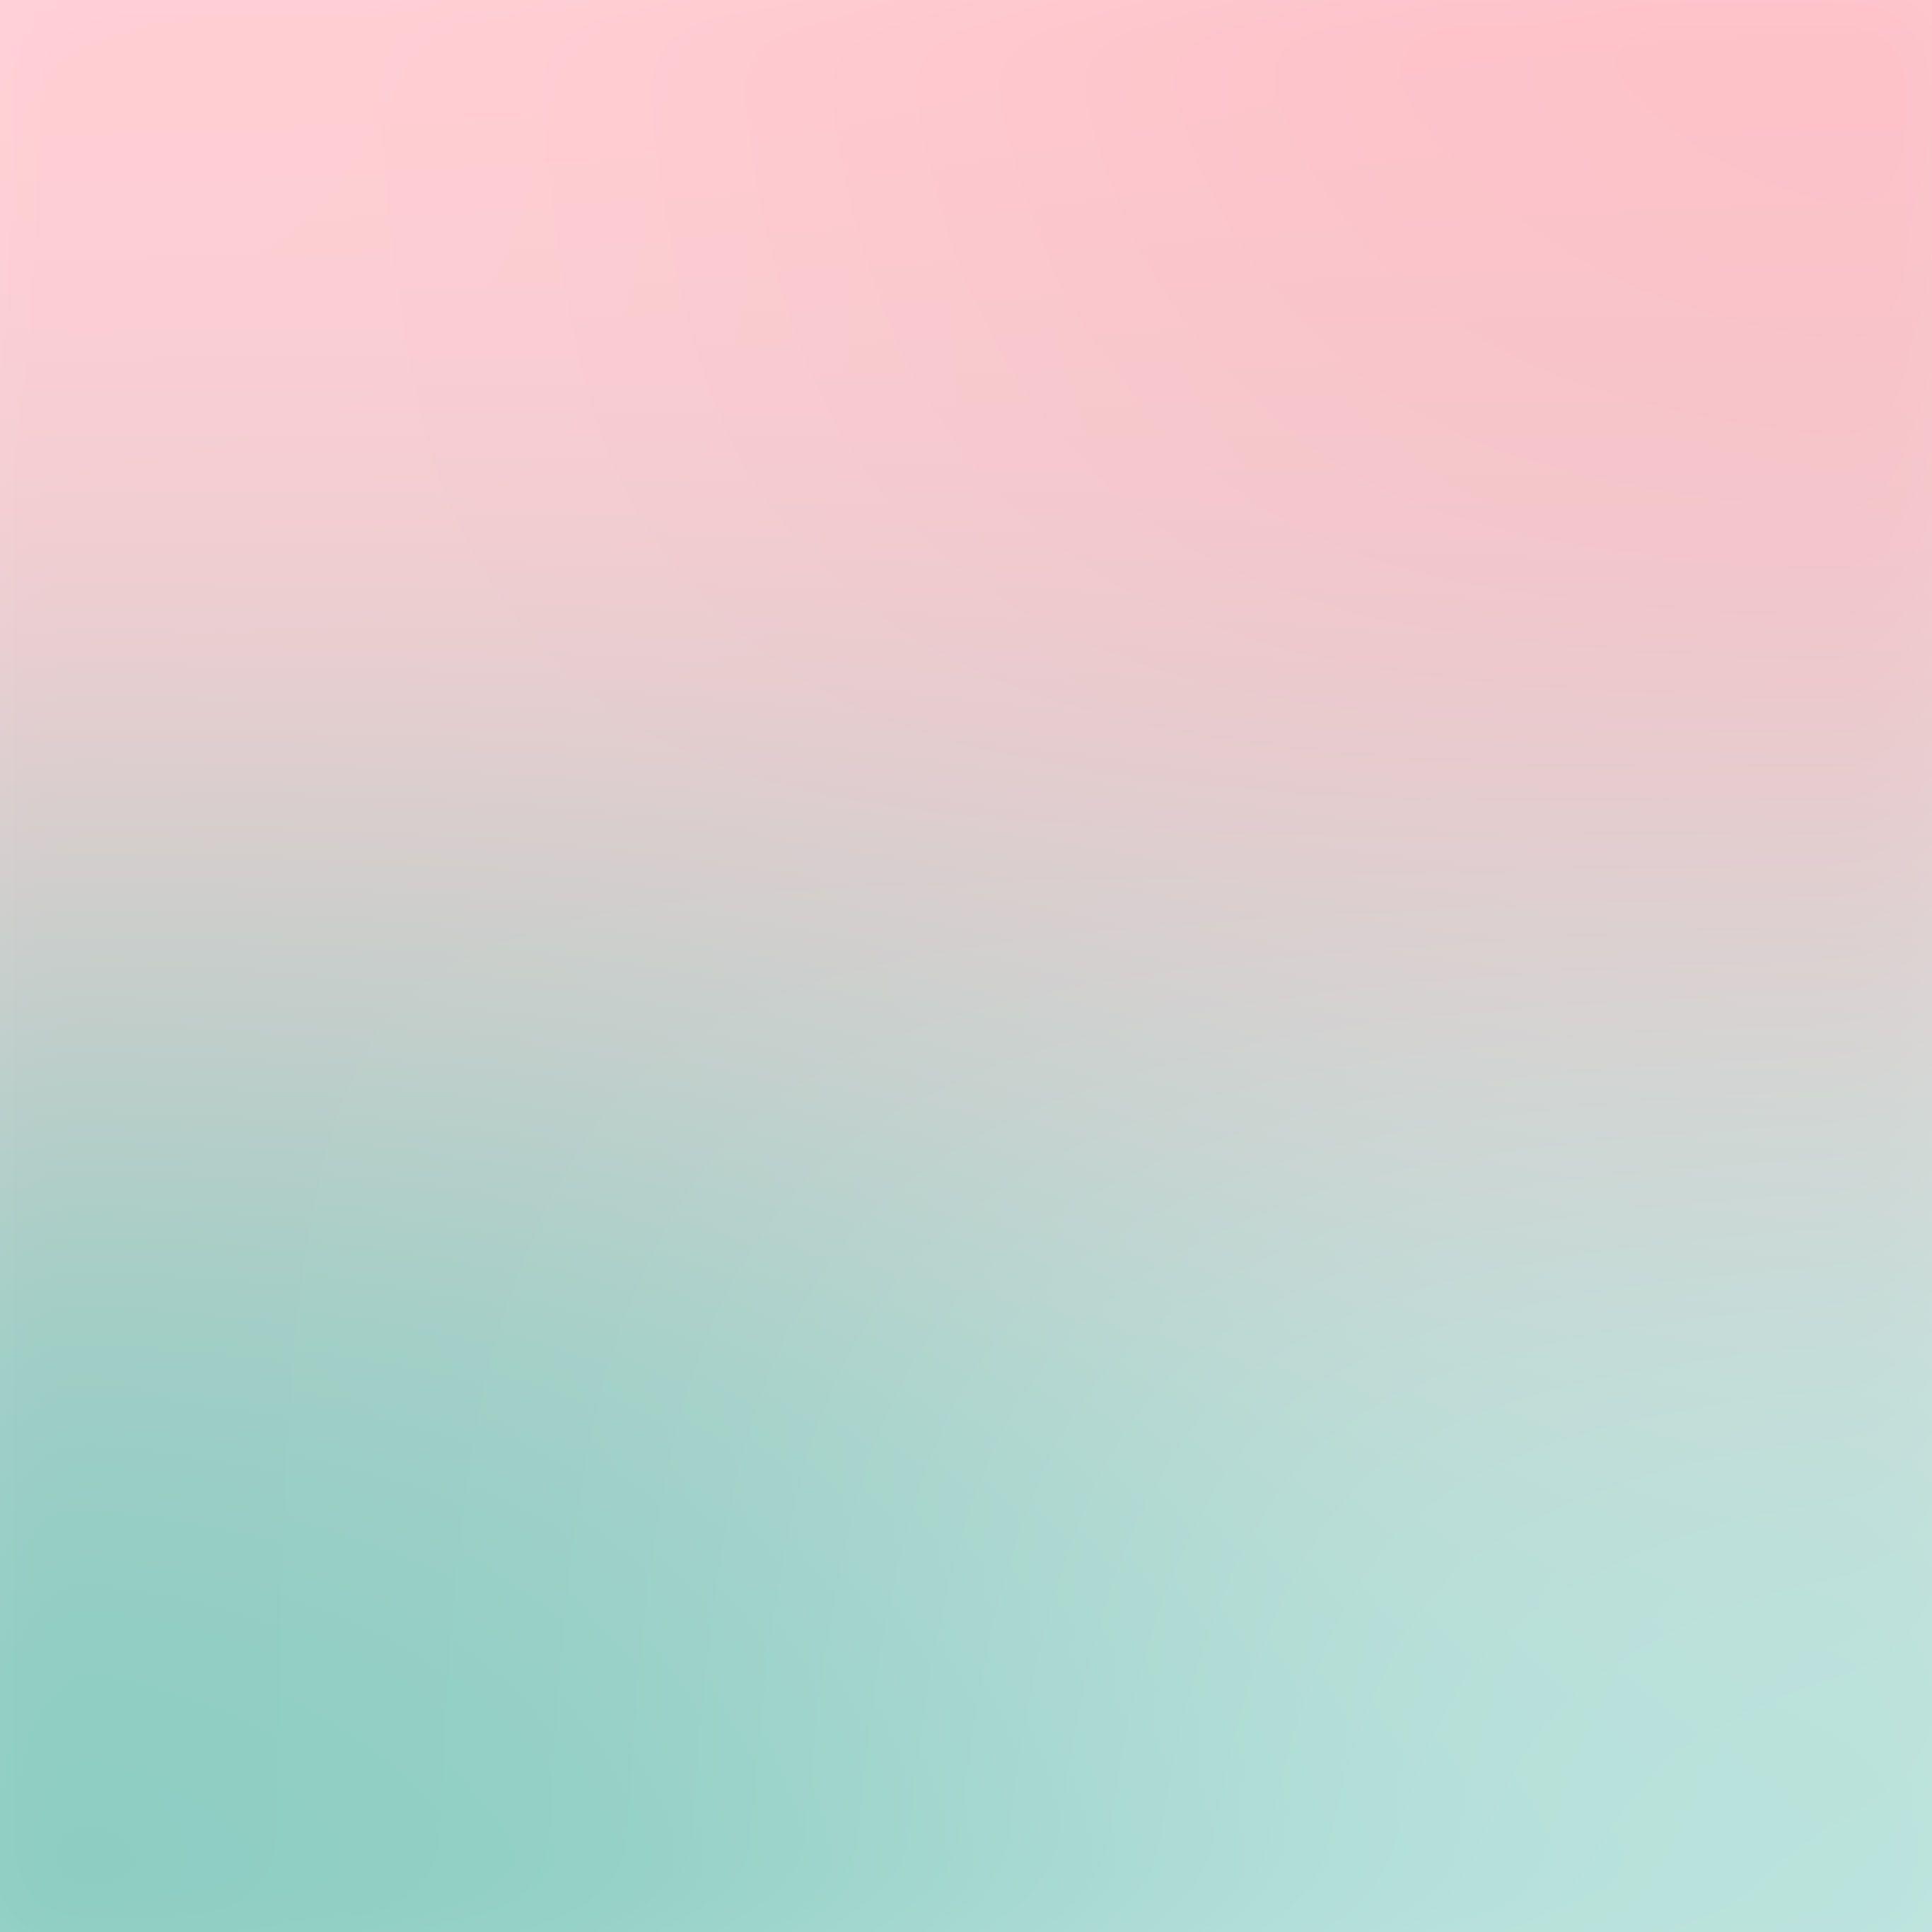 Pastel Ipad Wallpapers Top Free Pastel Ipad Backgrounds Wallpaperaccess